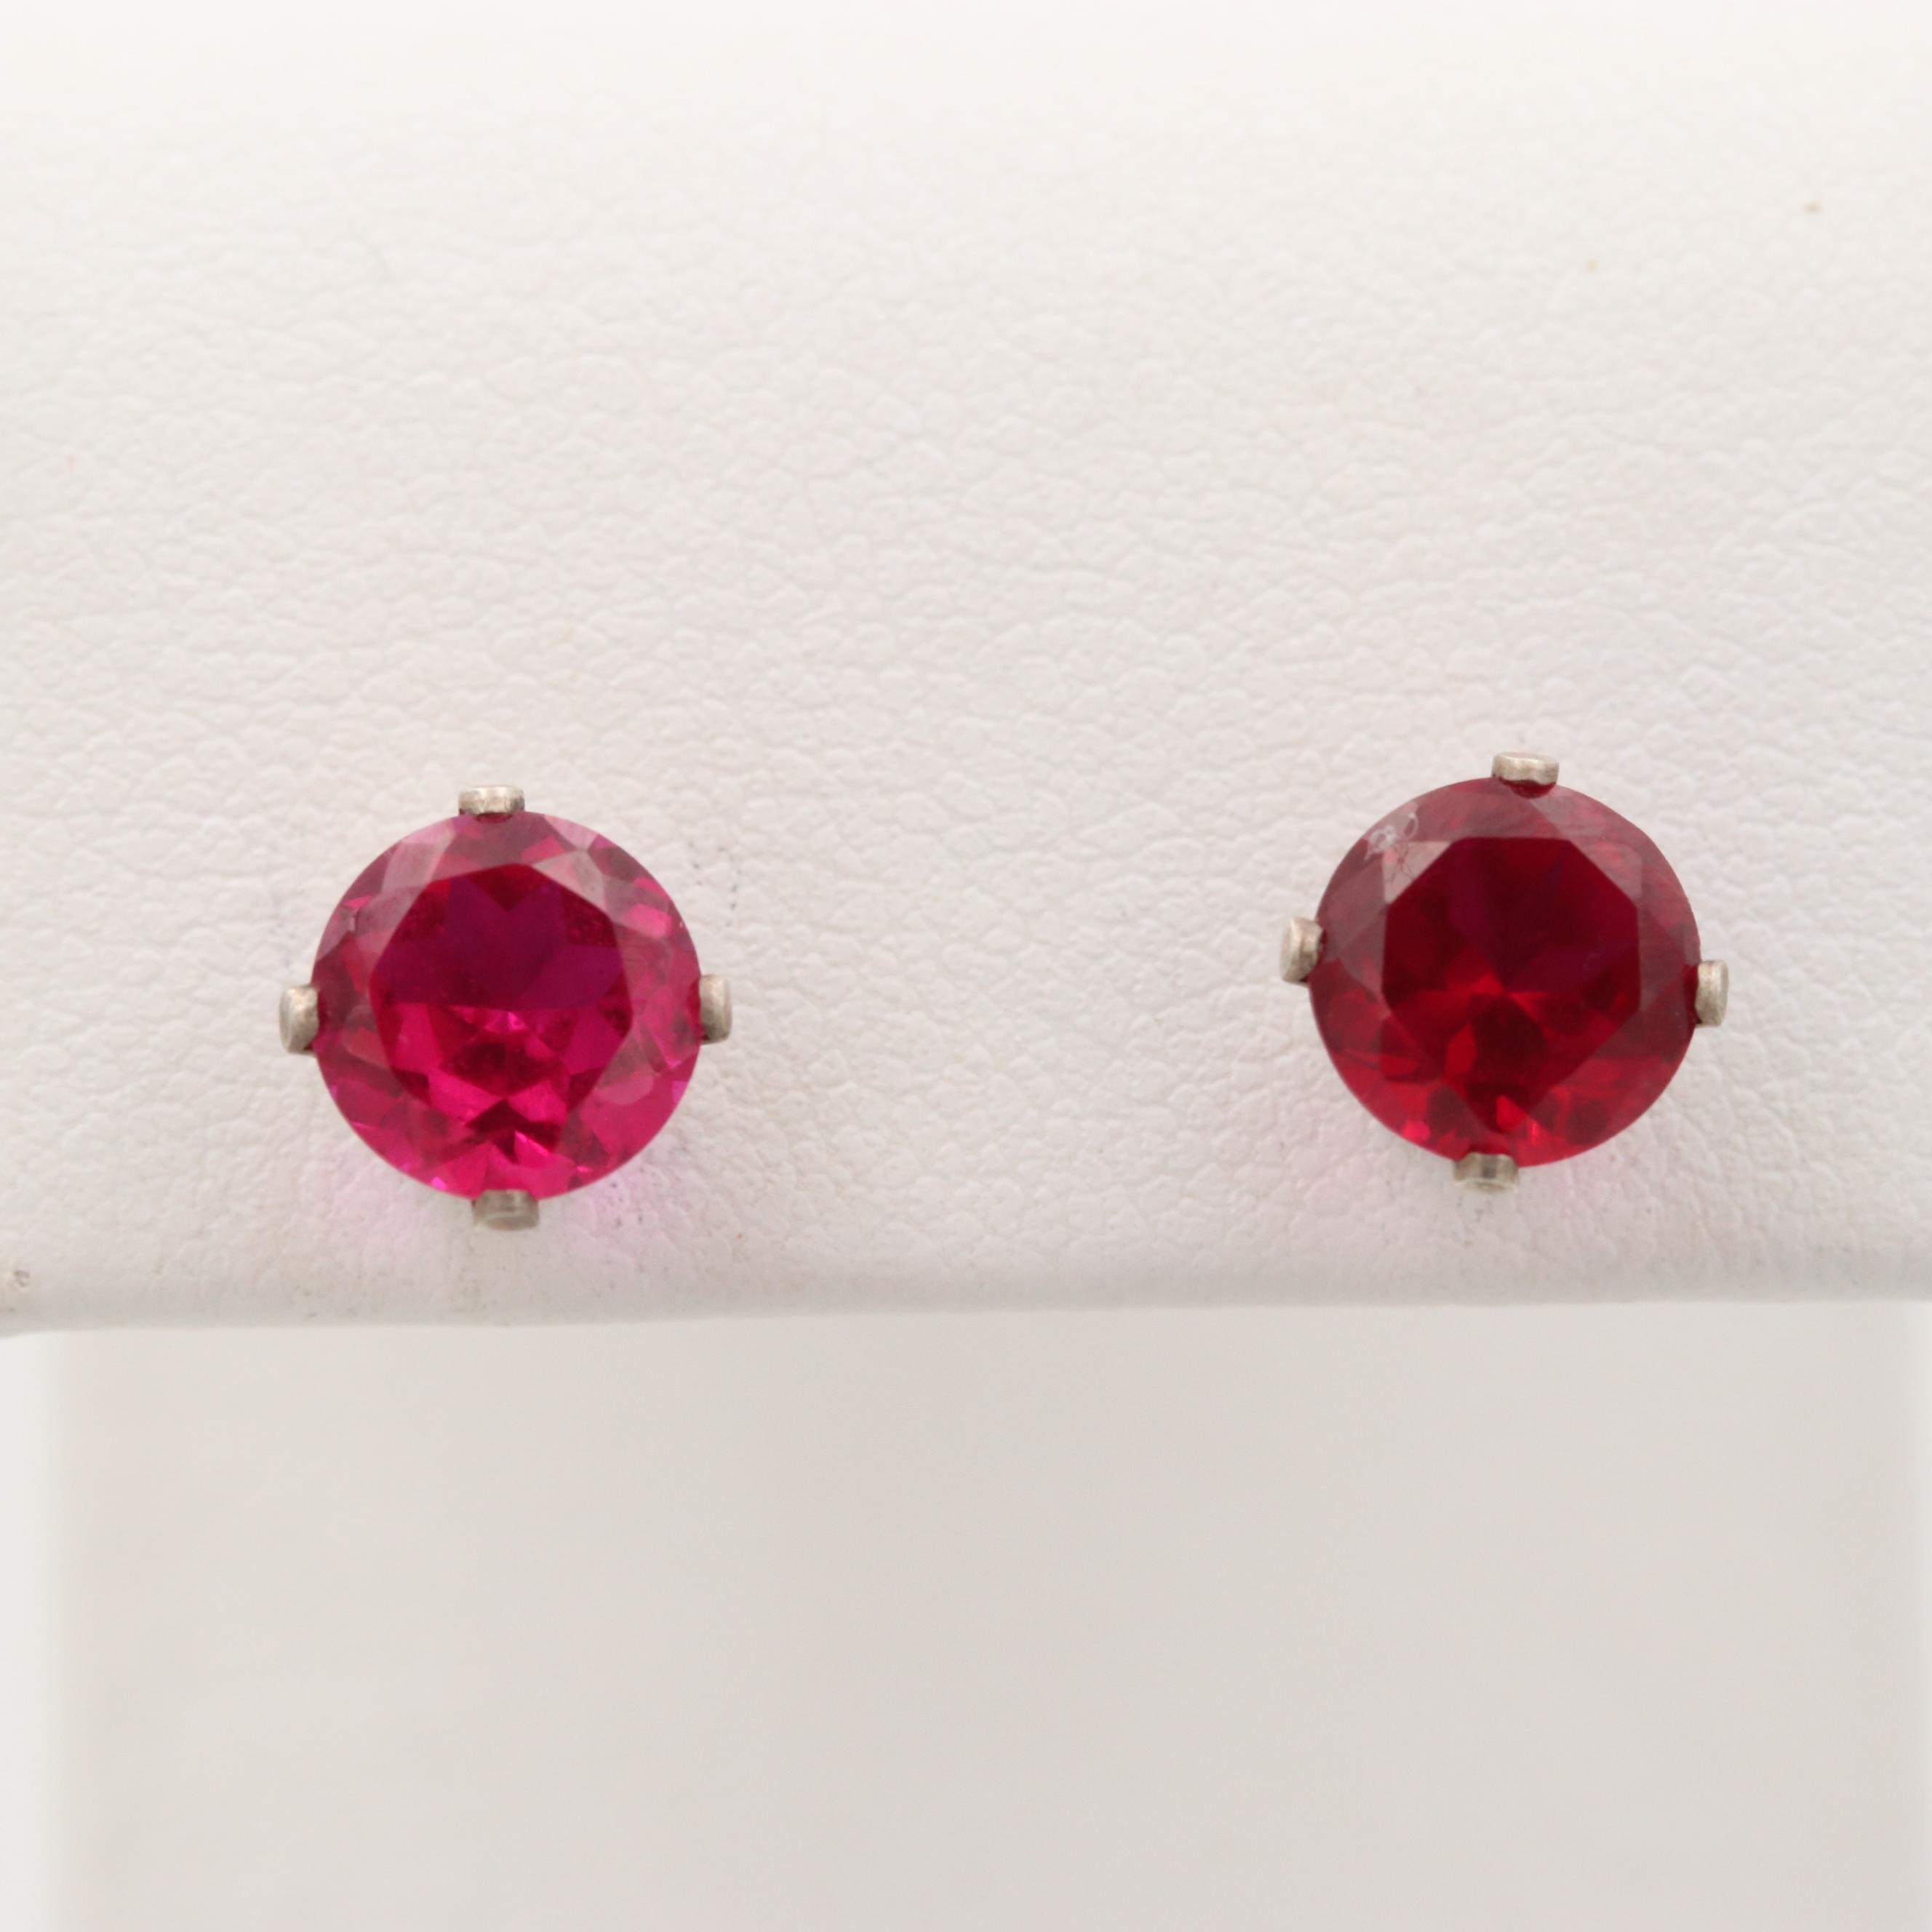 Sterling Silver Synthetic Ruby Stud Earrings